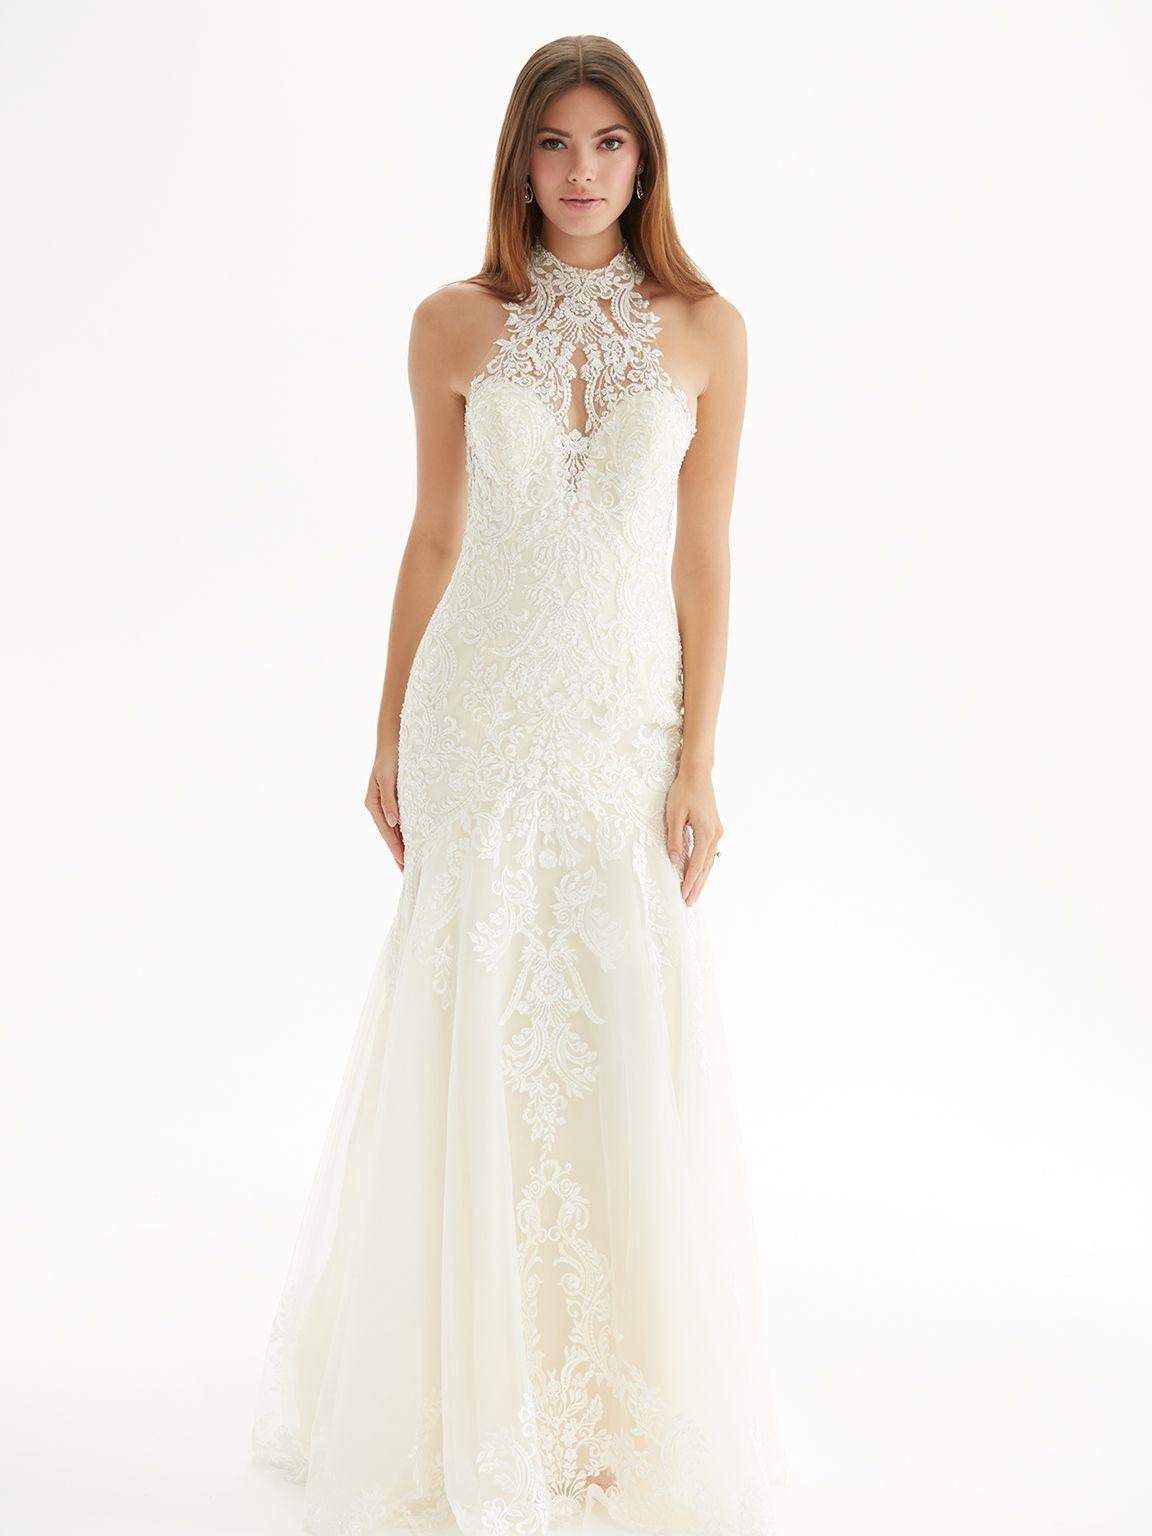 Allure Madison James MJ412 --- New York Bride & Groom {Charlotte ...